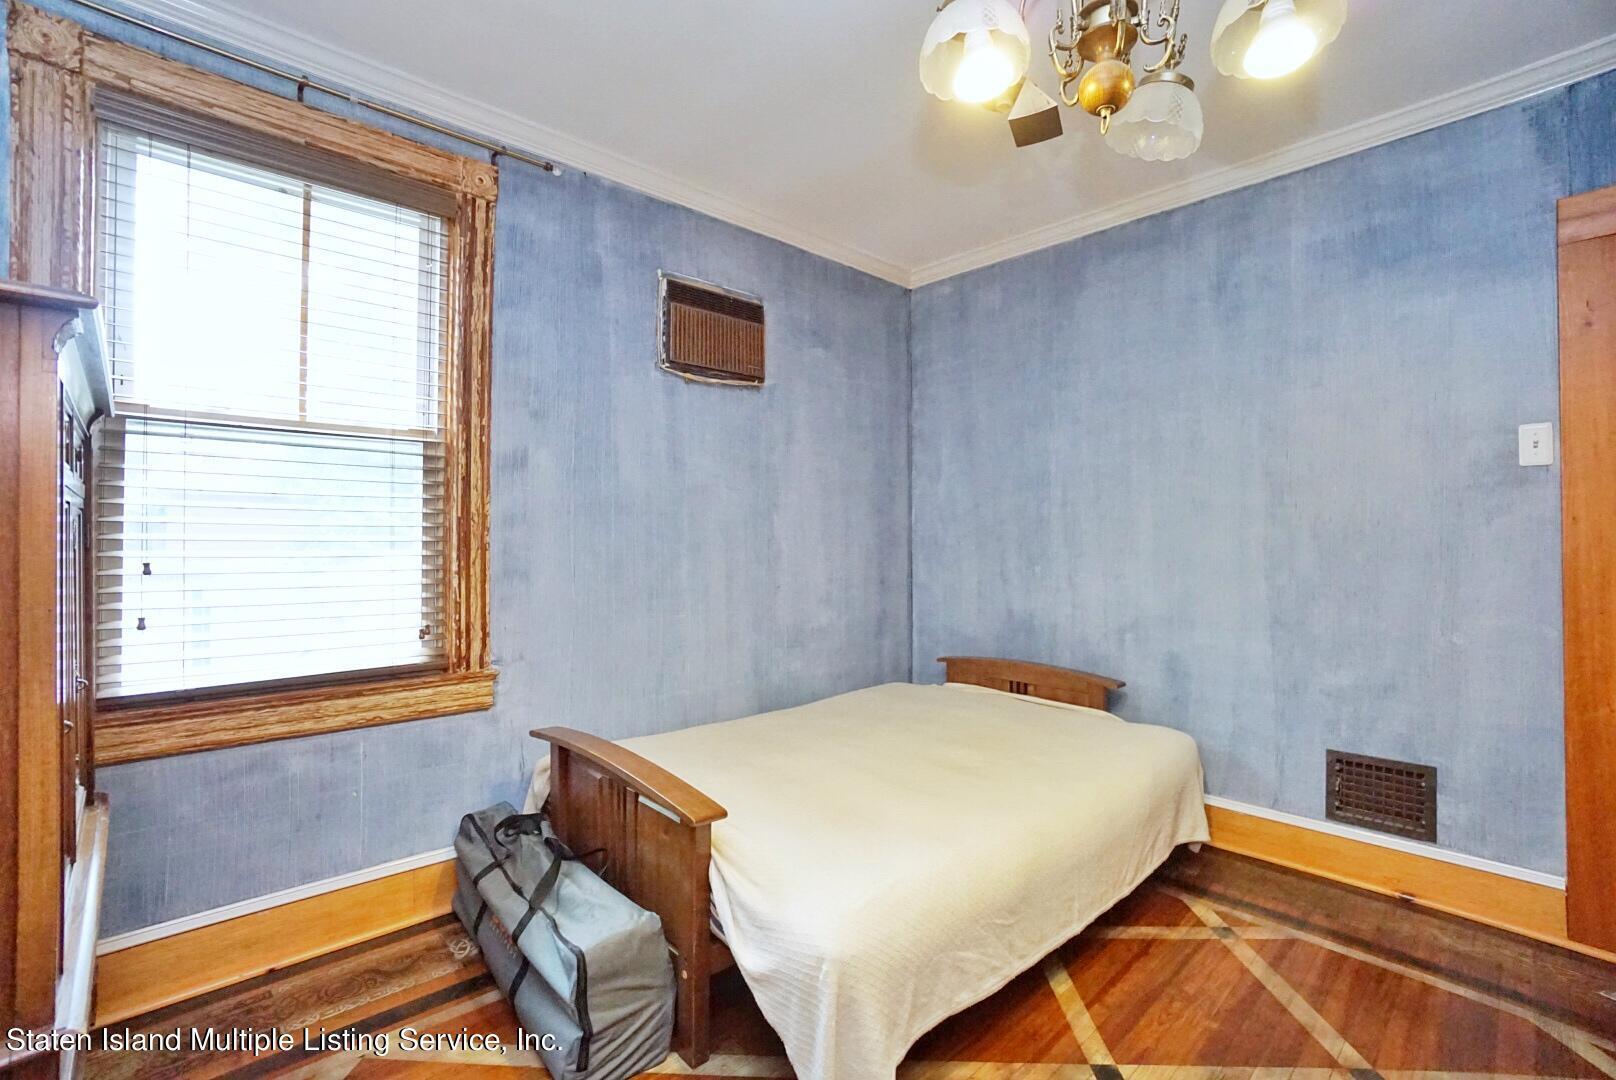 Single Family - Detached 136 York Avenue  Staten Island, NY 10301, MLS-1147575-36